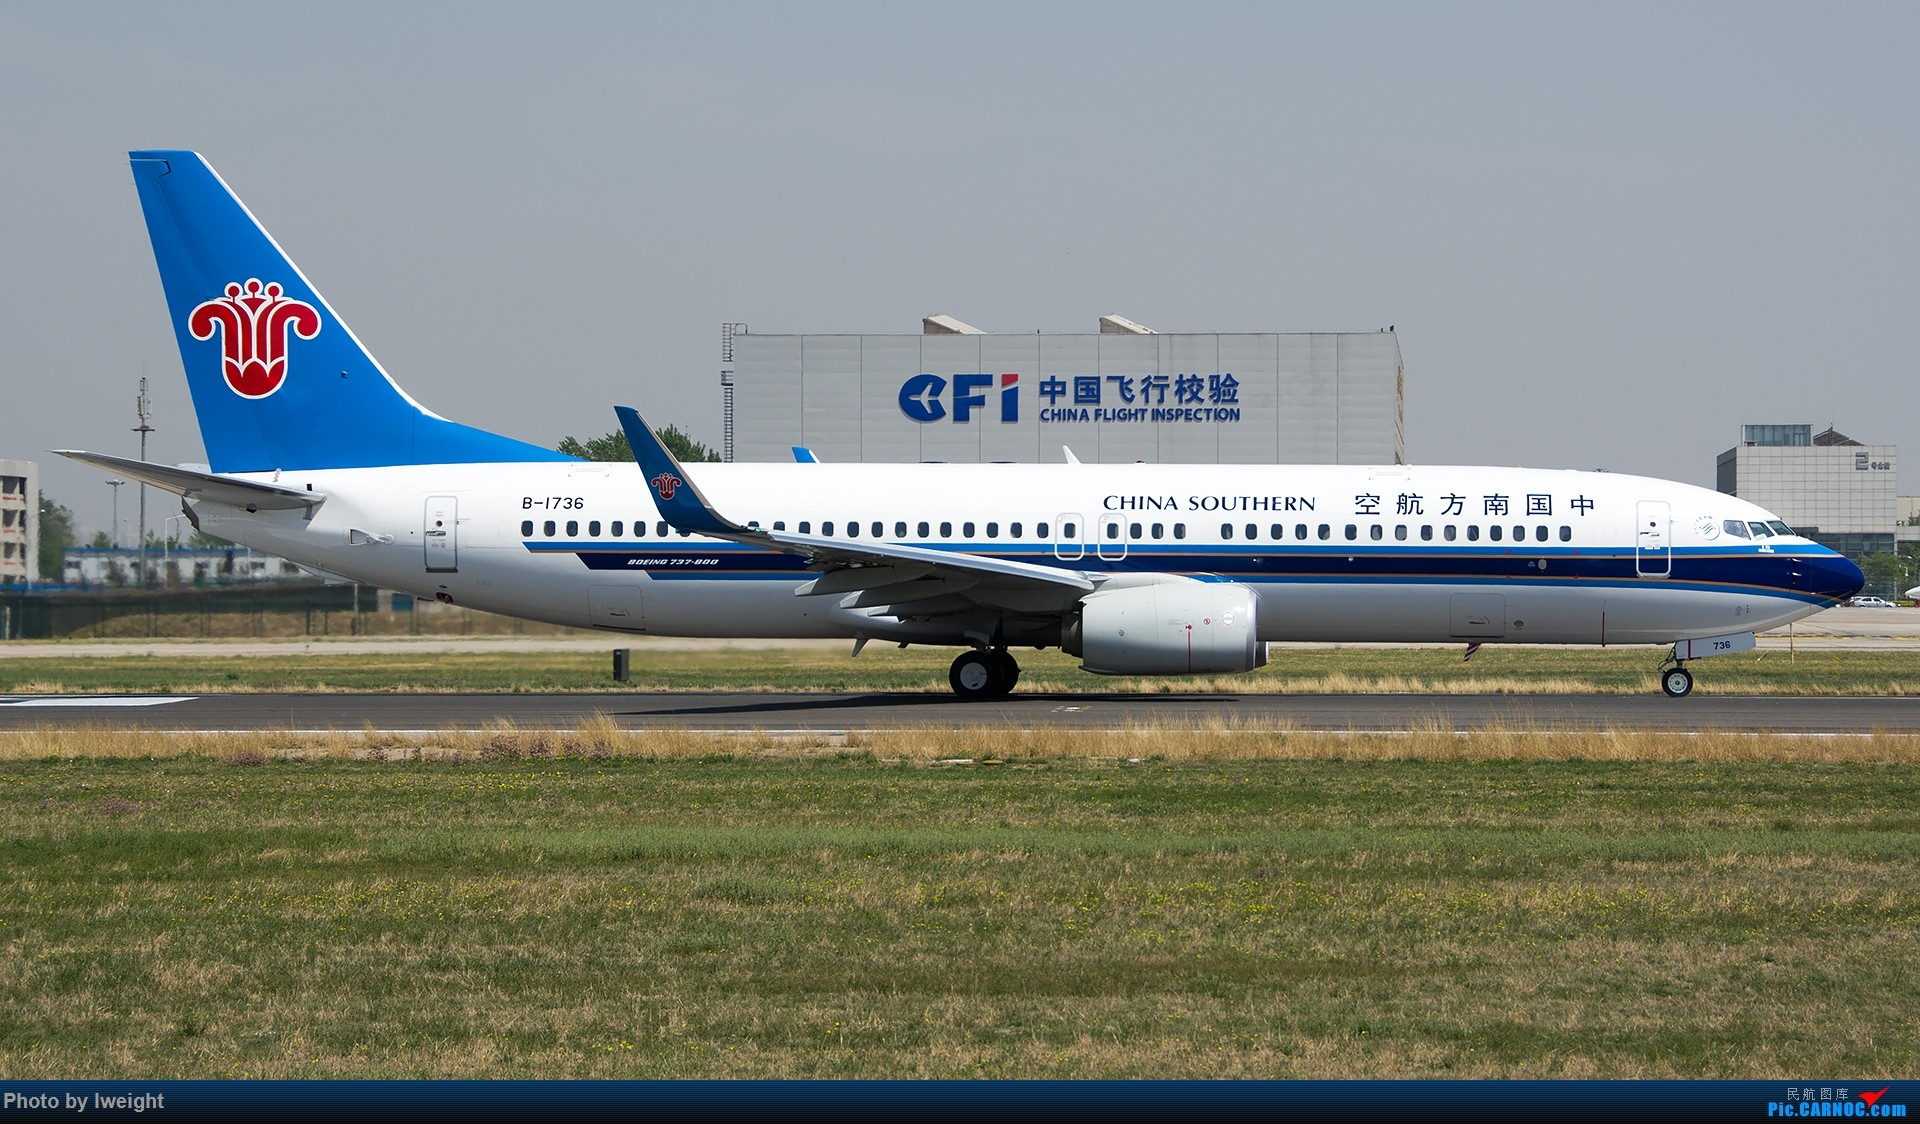 Re:[原创]2015年第一次在PEK拍北向南,其实是为Jimmy去的【2015-4-24】 BOEING 737-800 B-1736 中国北京首都国际机场